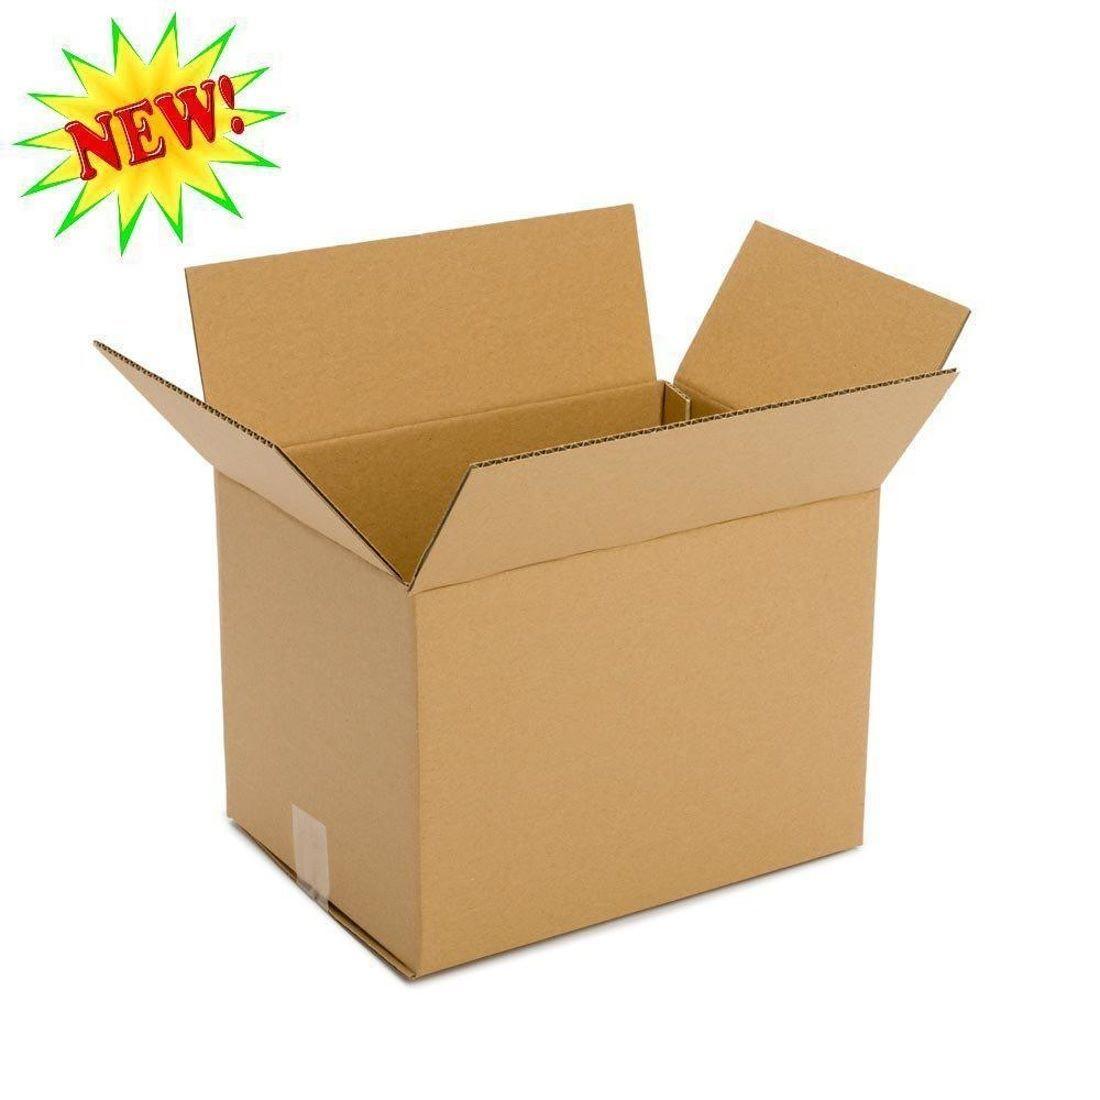 Pratt cardboard boxes 18 length x 12 width x 10 height pack of pratt cardboard boxes 18 length x 12 width x 10 height pack reheart Gallery